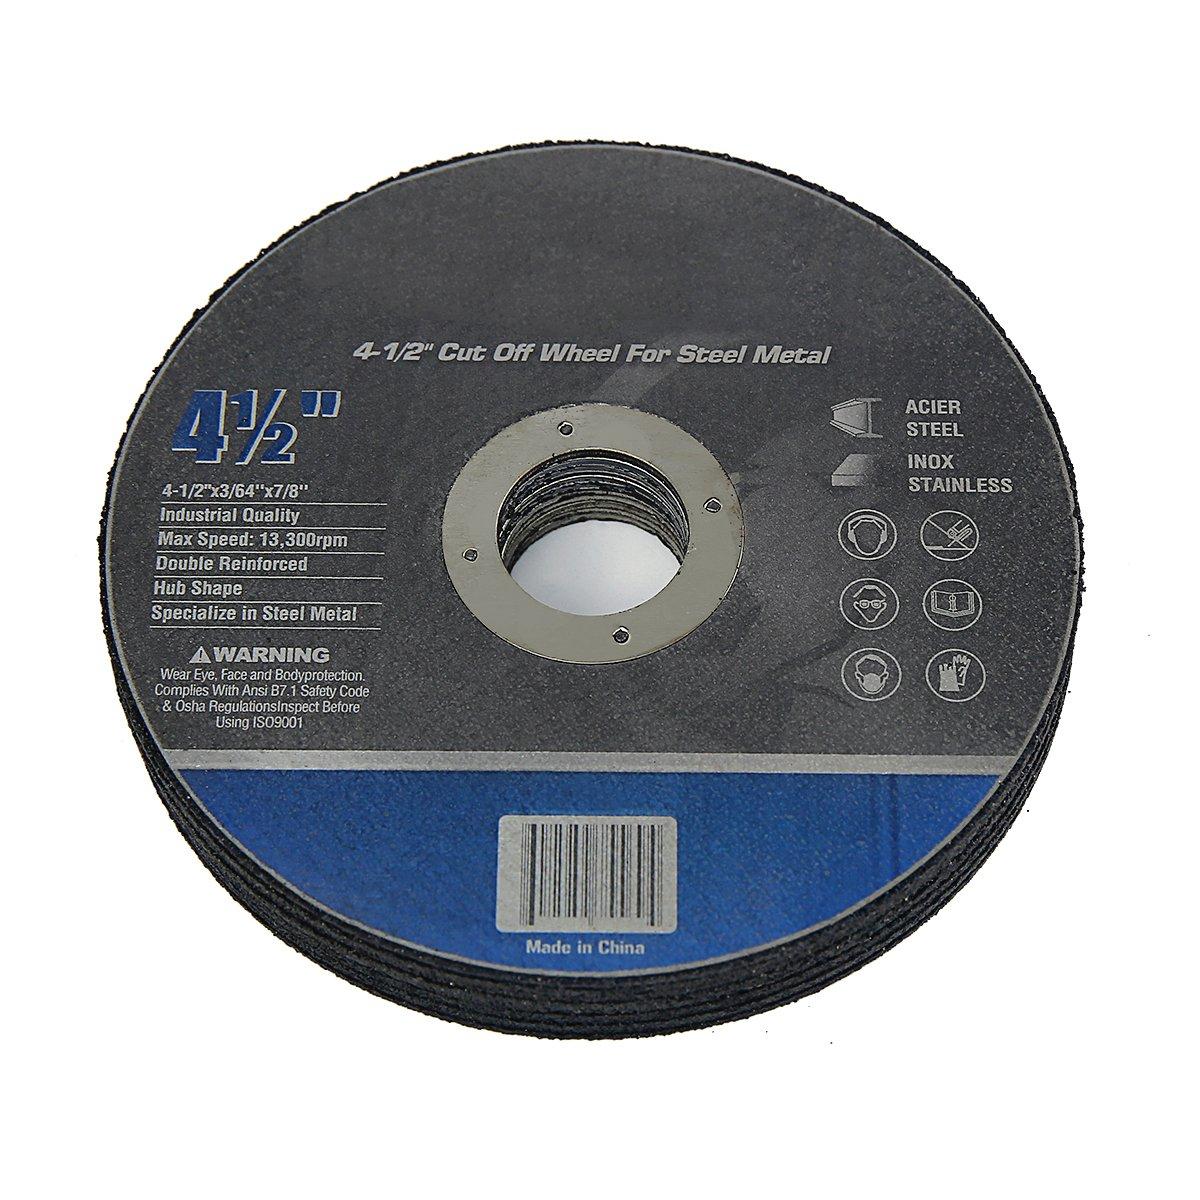 Cut-off Wheels 4-1/2 Inch by 3/64 Inch by 7/8 Inch Steel Metal (Set of 10)